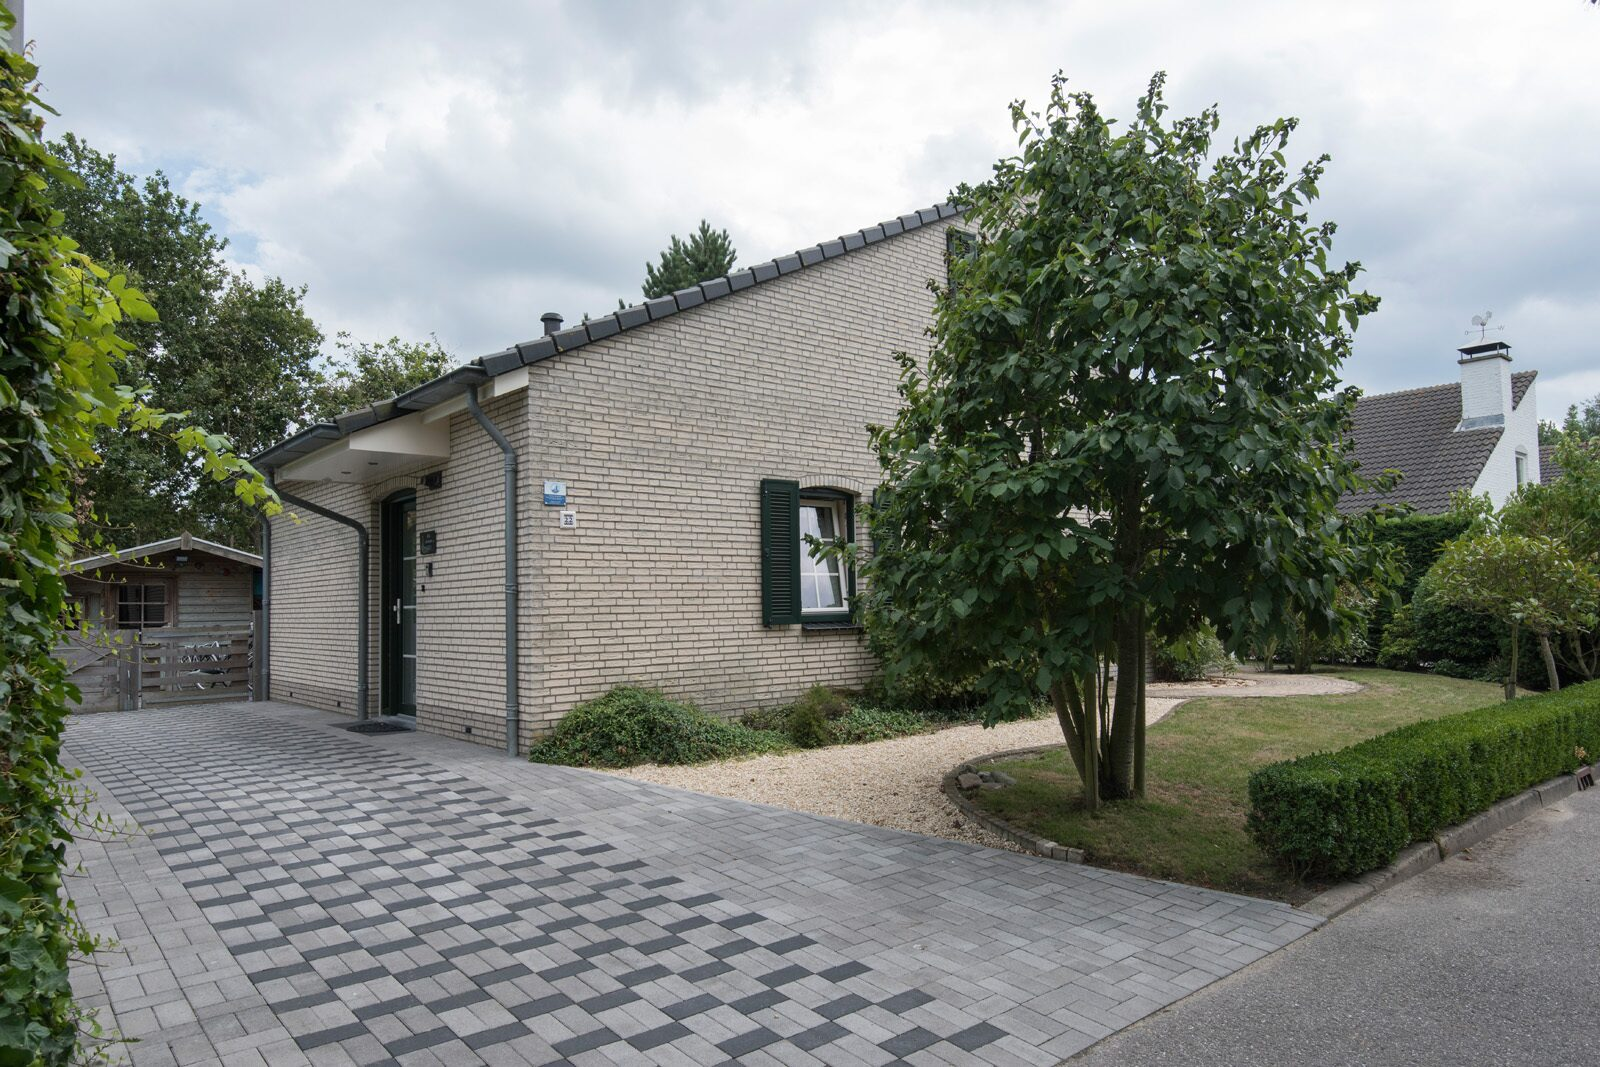 Doggersbank 22 - Noordzeepark Ouddorp